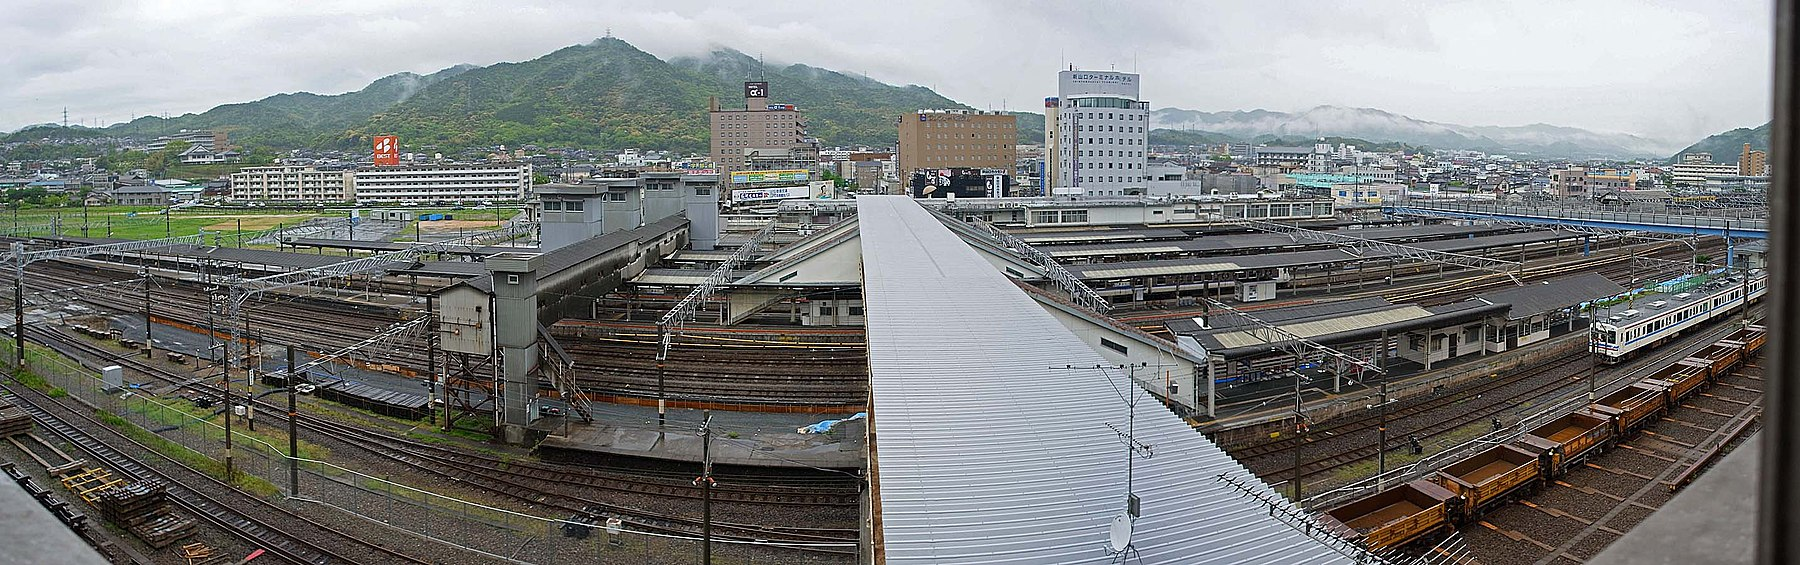 JR Shin yamaguchi station , JR 新山口駅 - panoramio (5).jpg